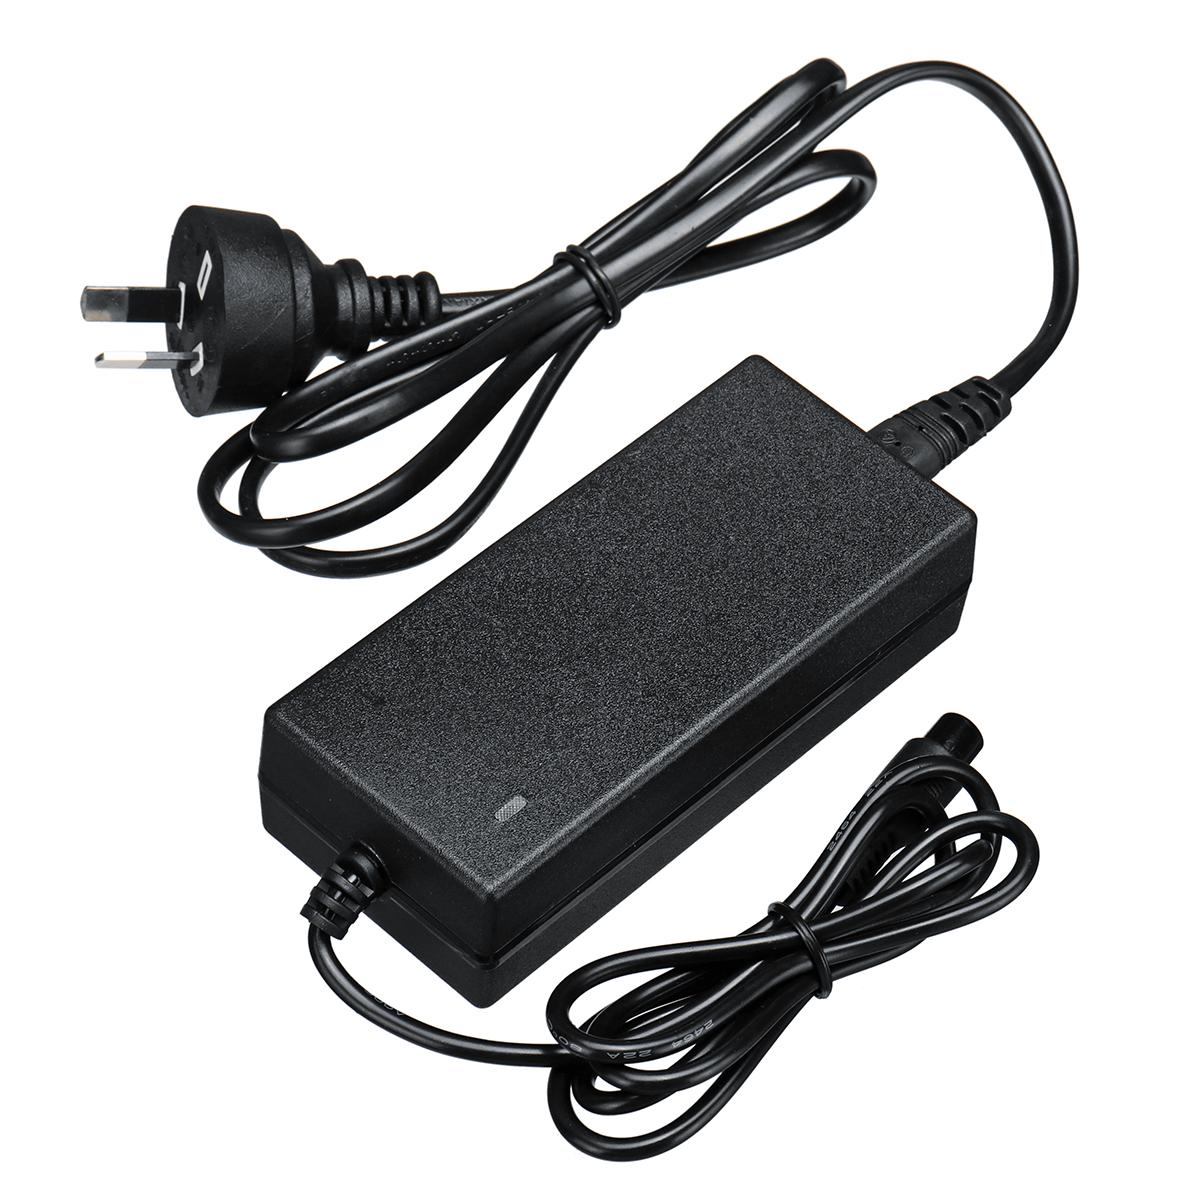 Адаптер питания Батарея Зарядное устройство для 2-х колес Smart Balance Scooter AU Plug